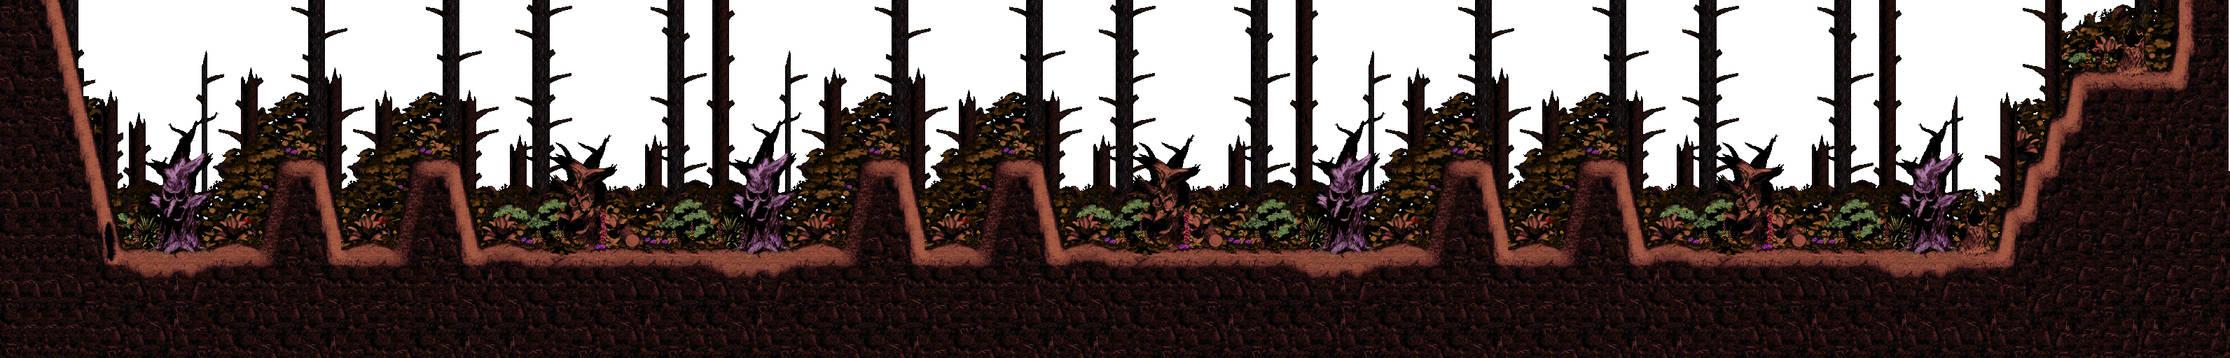 Squitter bonus woods